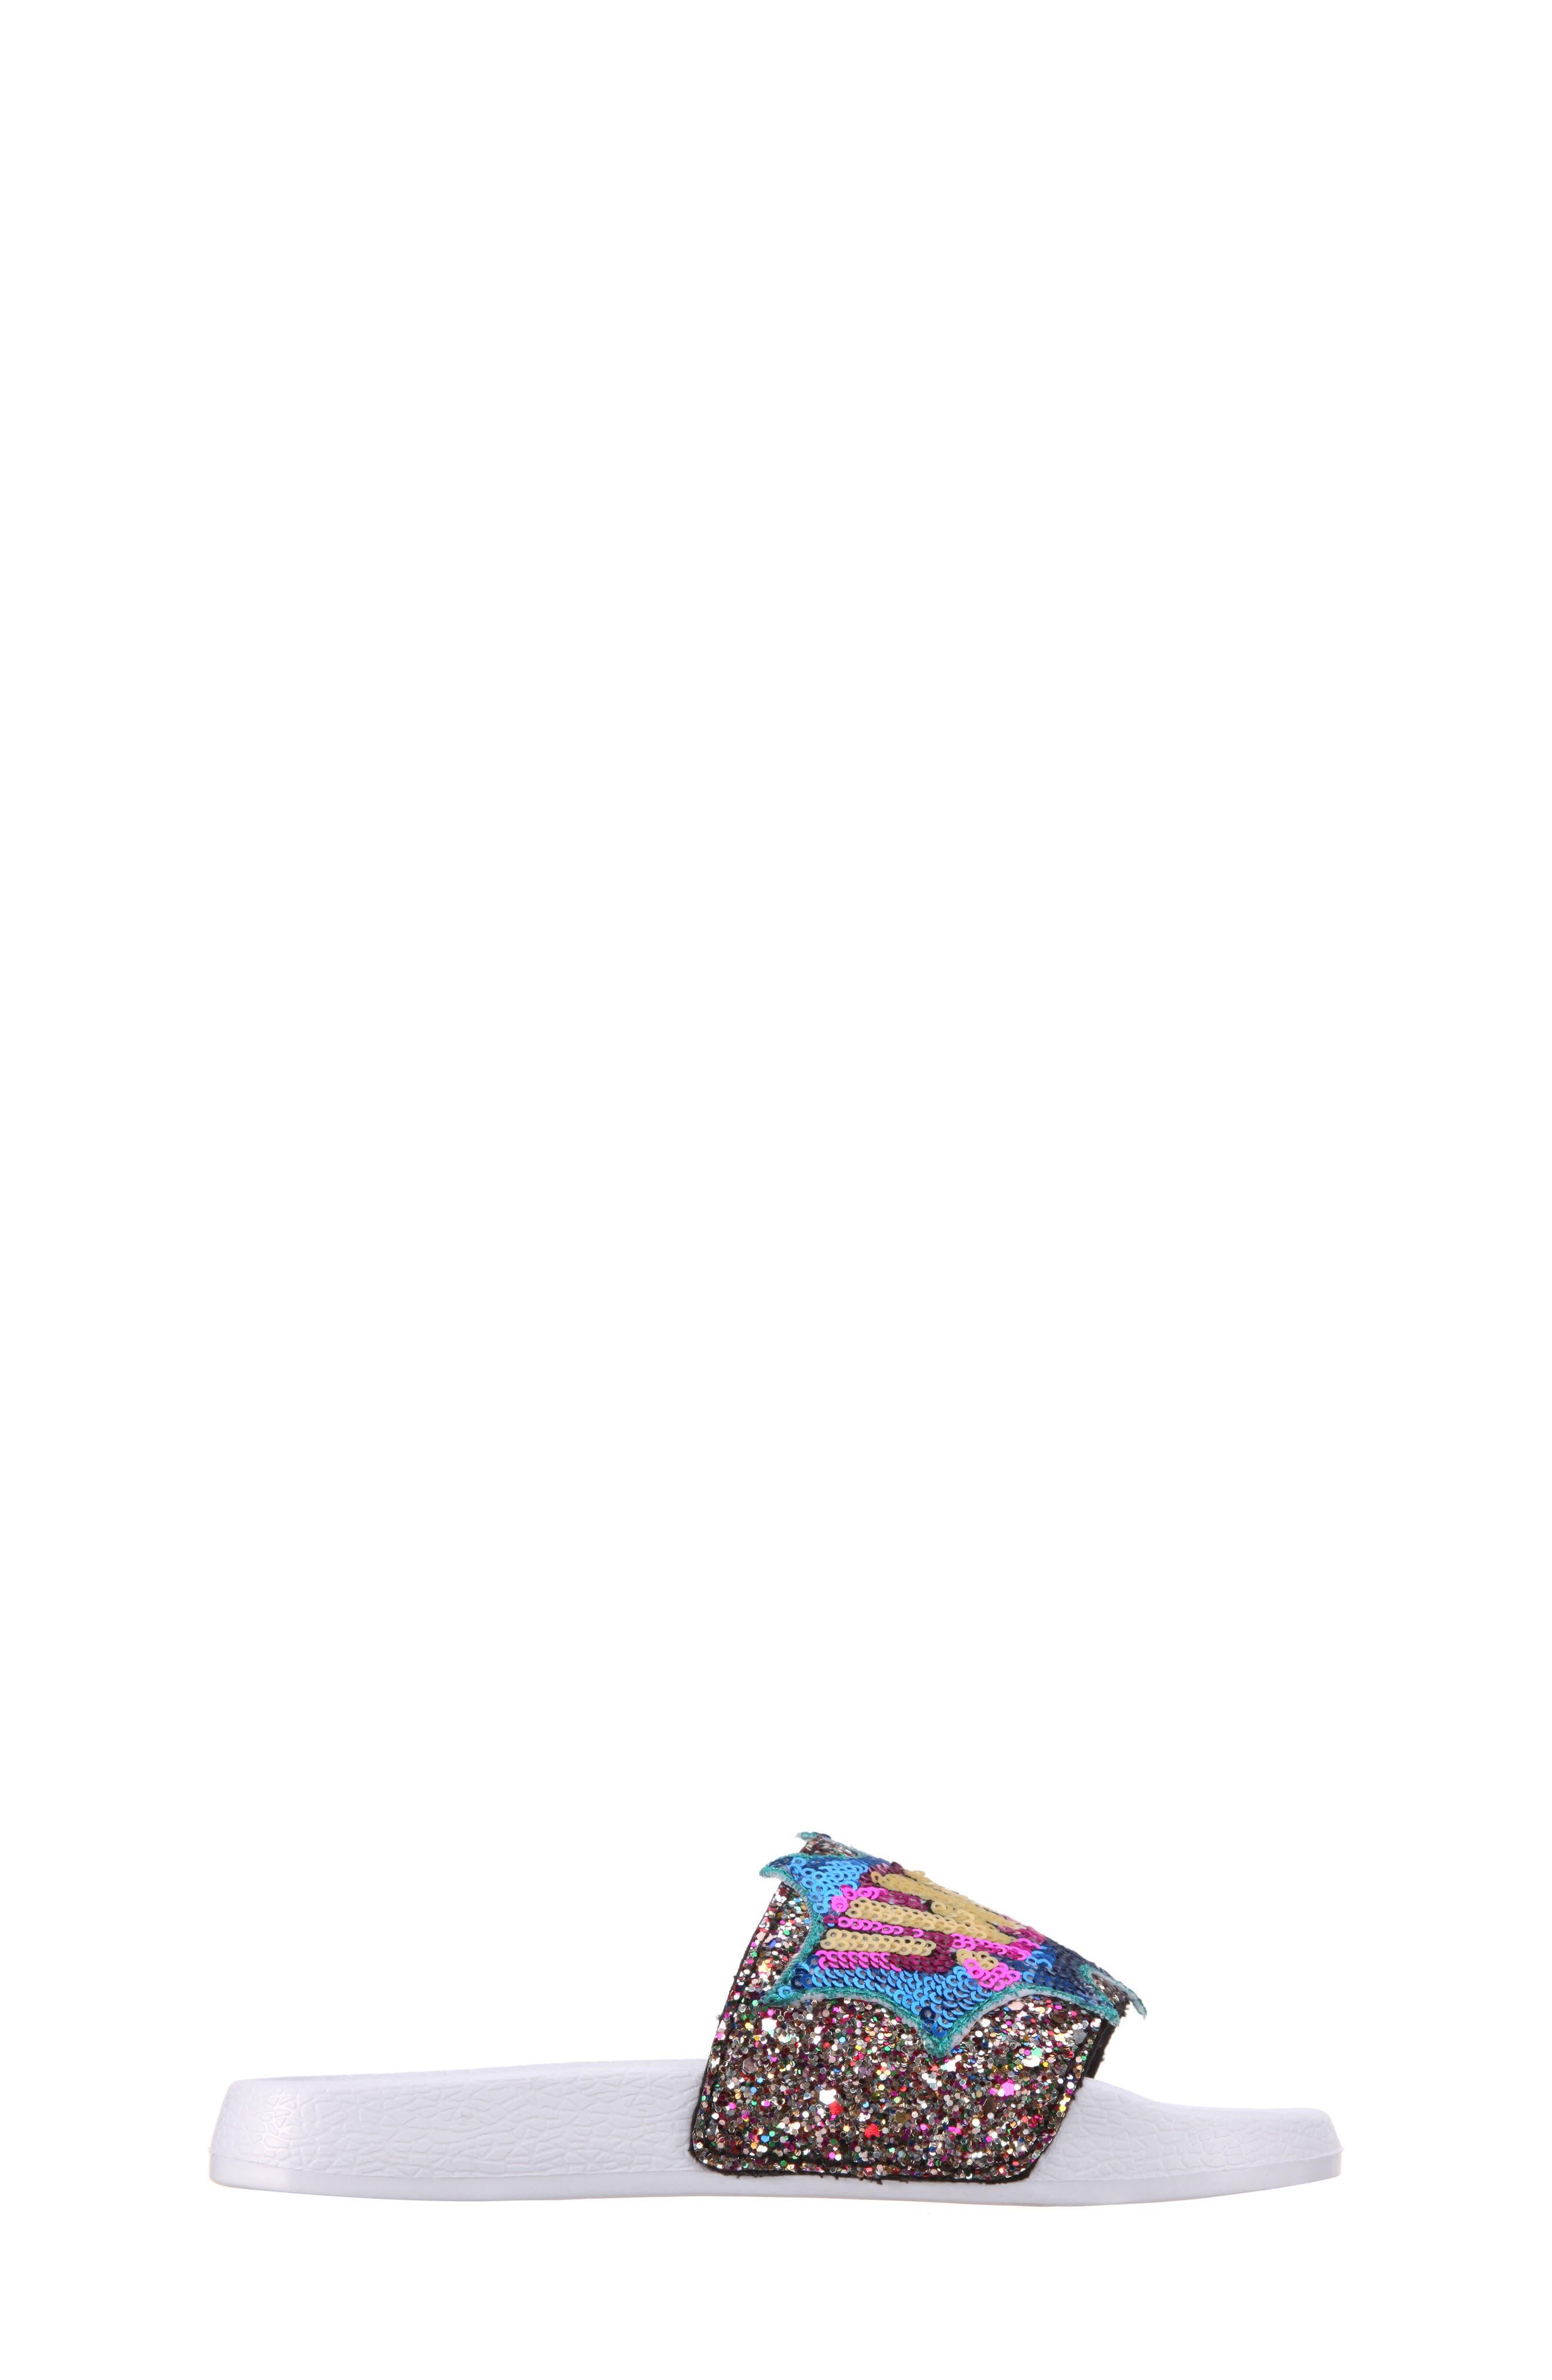 Sabreena2 Sequined Sport Slide,                             Alternate thumbnail 3, color,                             Multi Chunky Glitter